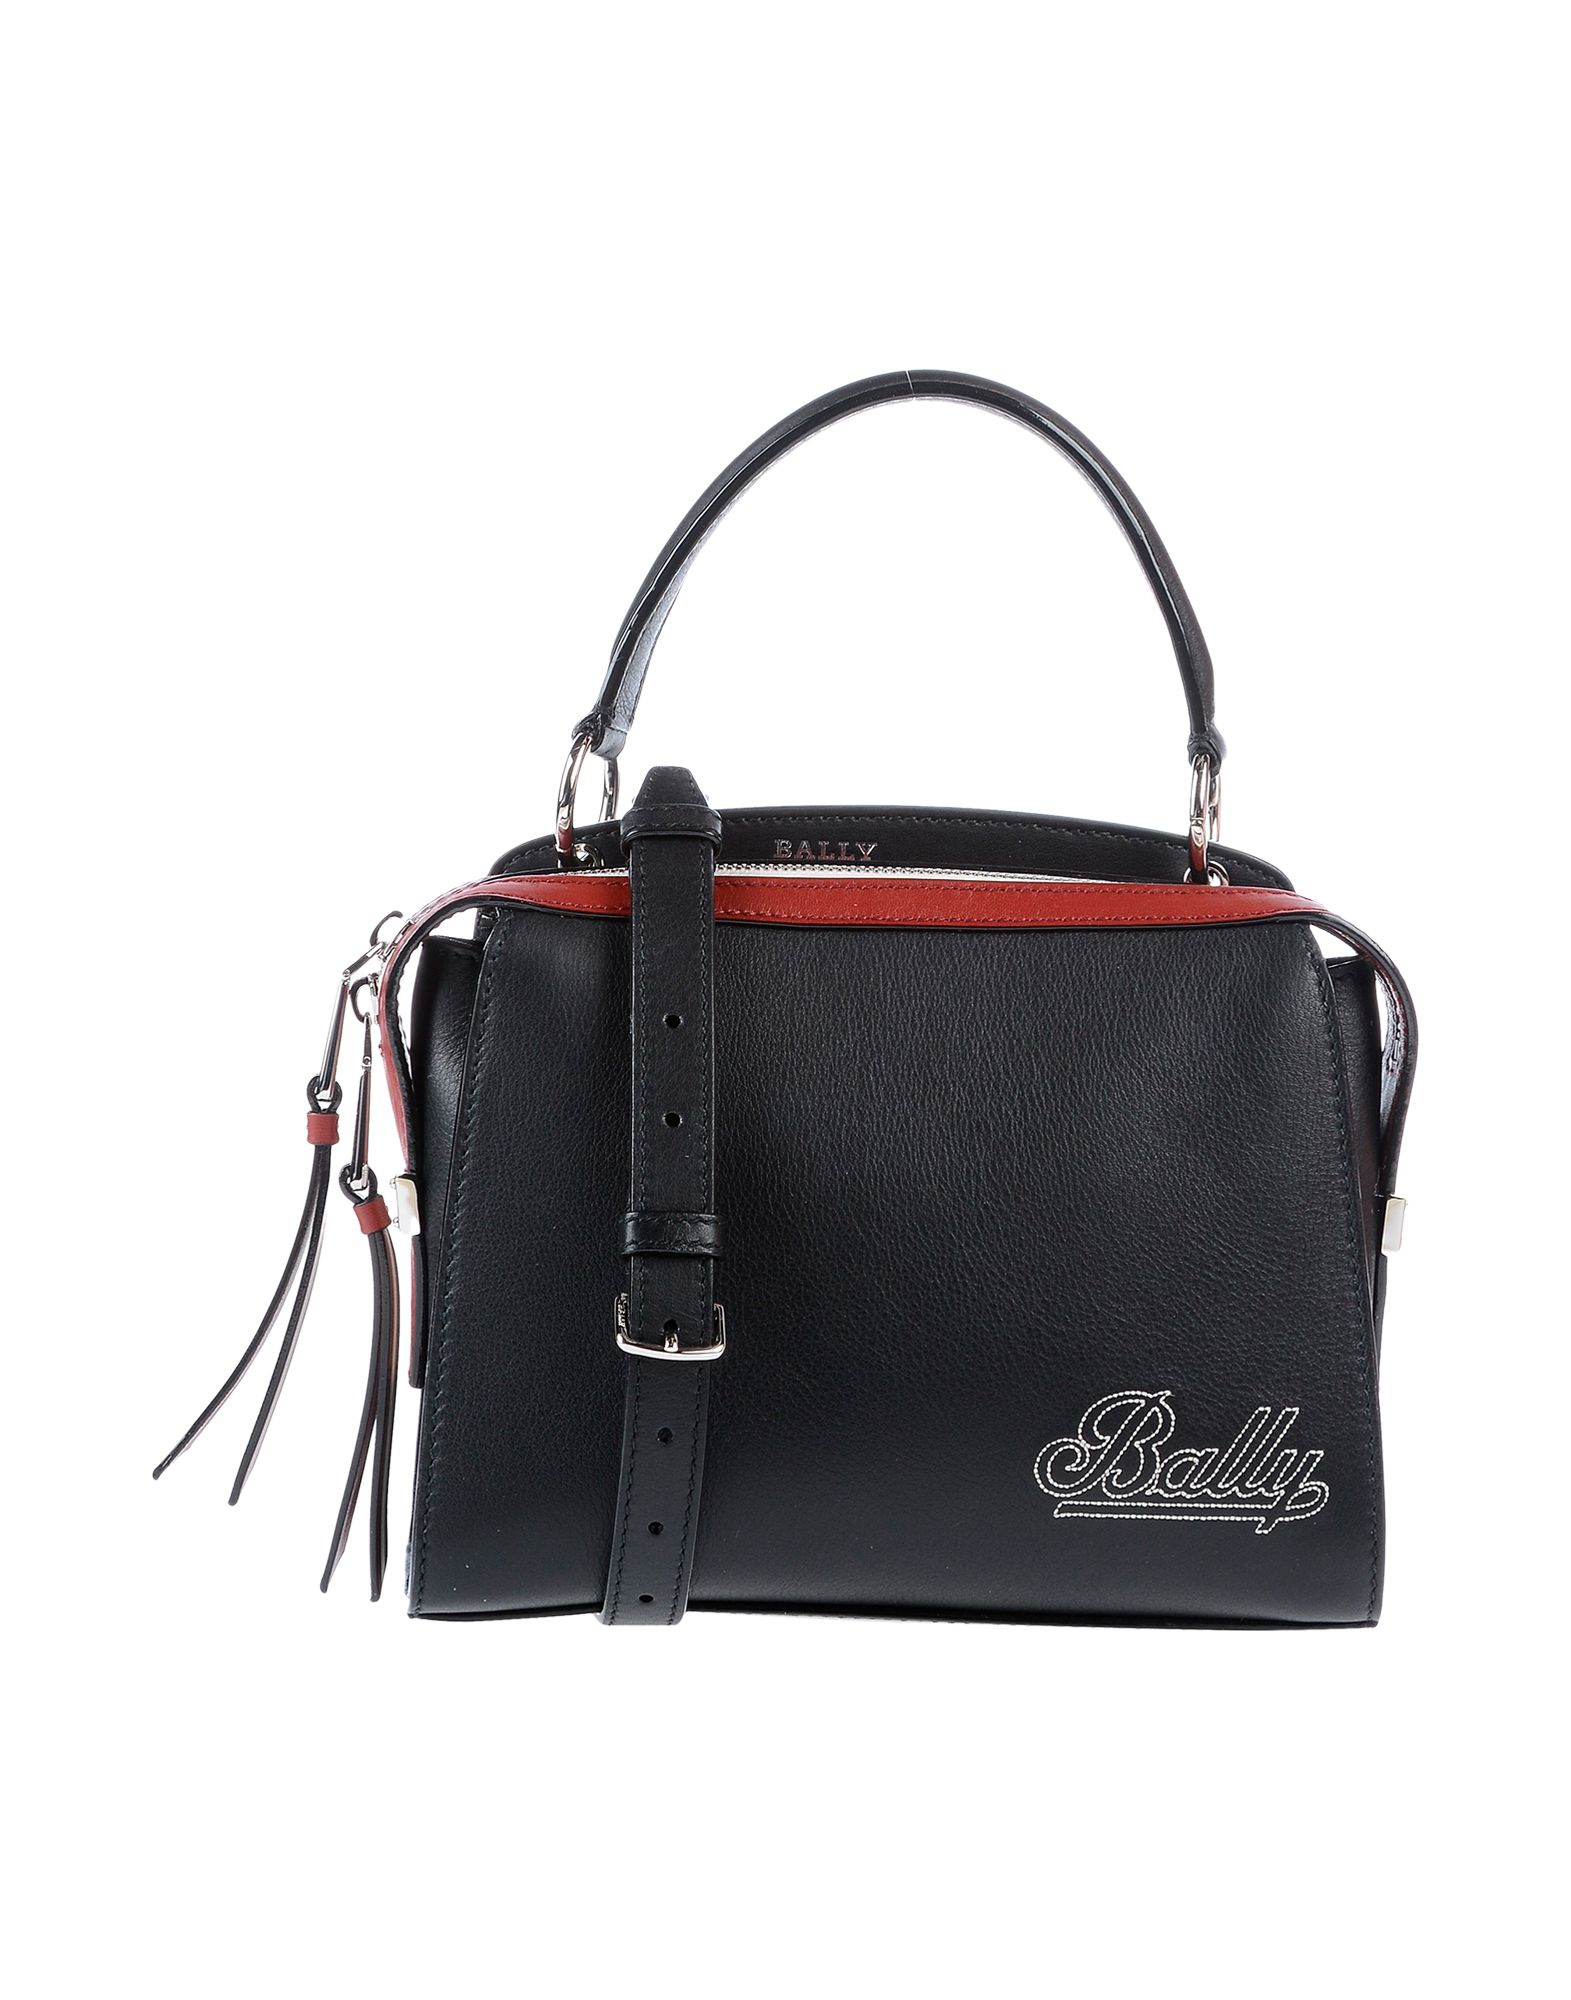 31a8efffee Bally Handbag - Women Bally Handbags online on YOOX United States ...